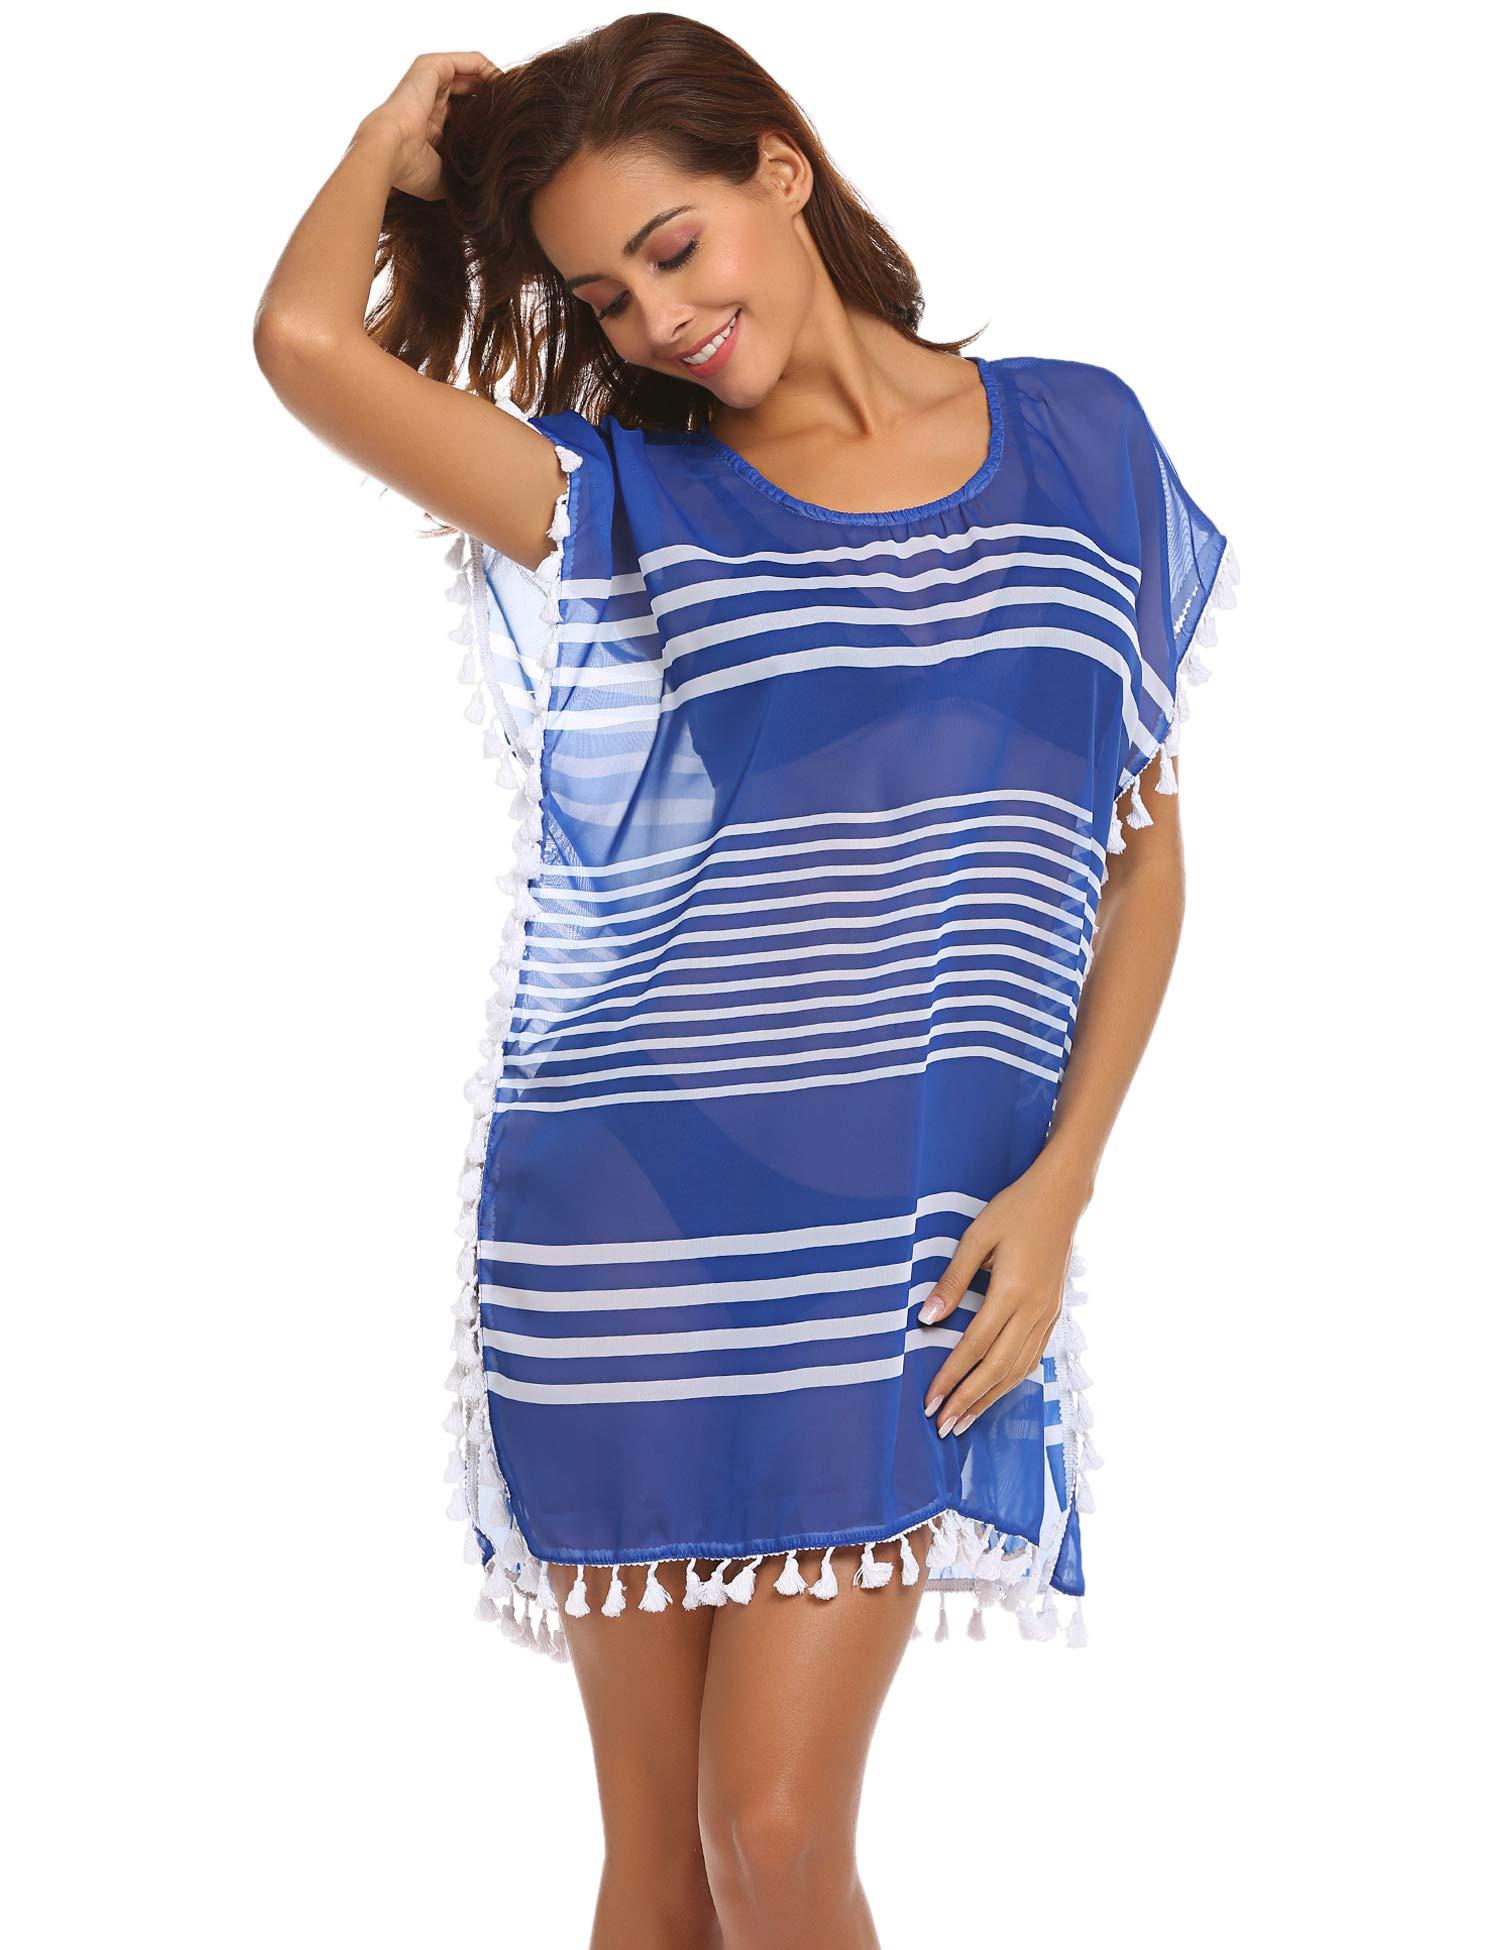 ADOME Women's Swimsuit Chiffon Bathing Suit Striped Beachwear Tassel Beach Cover up Striped Blue XL